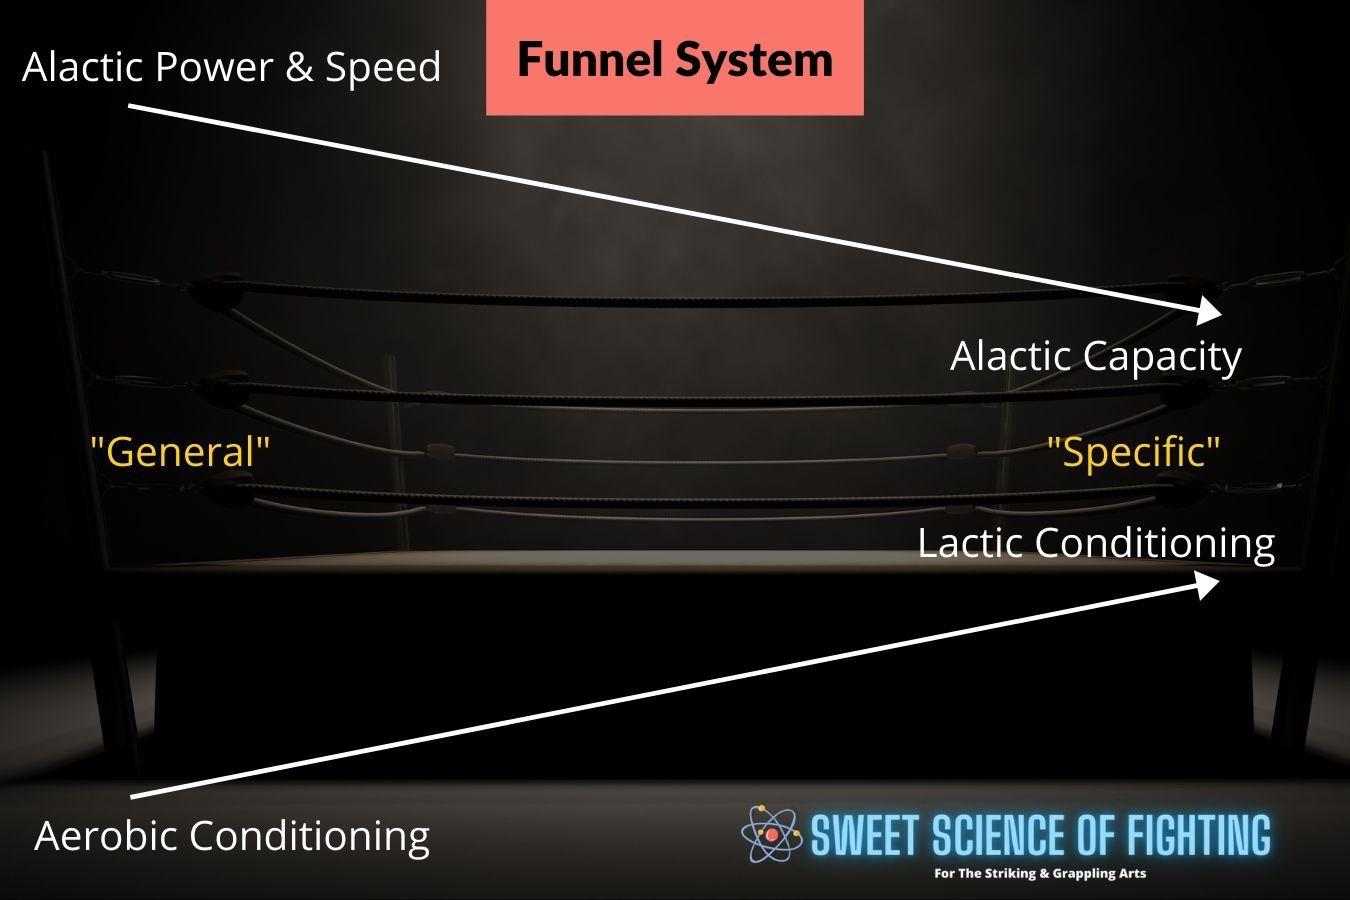 Funnel System